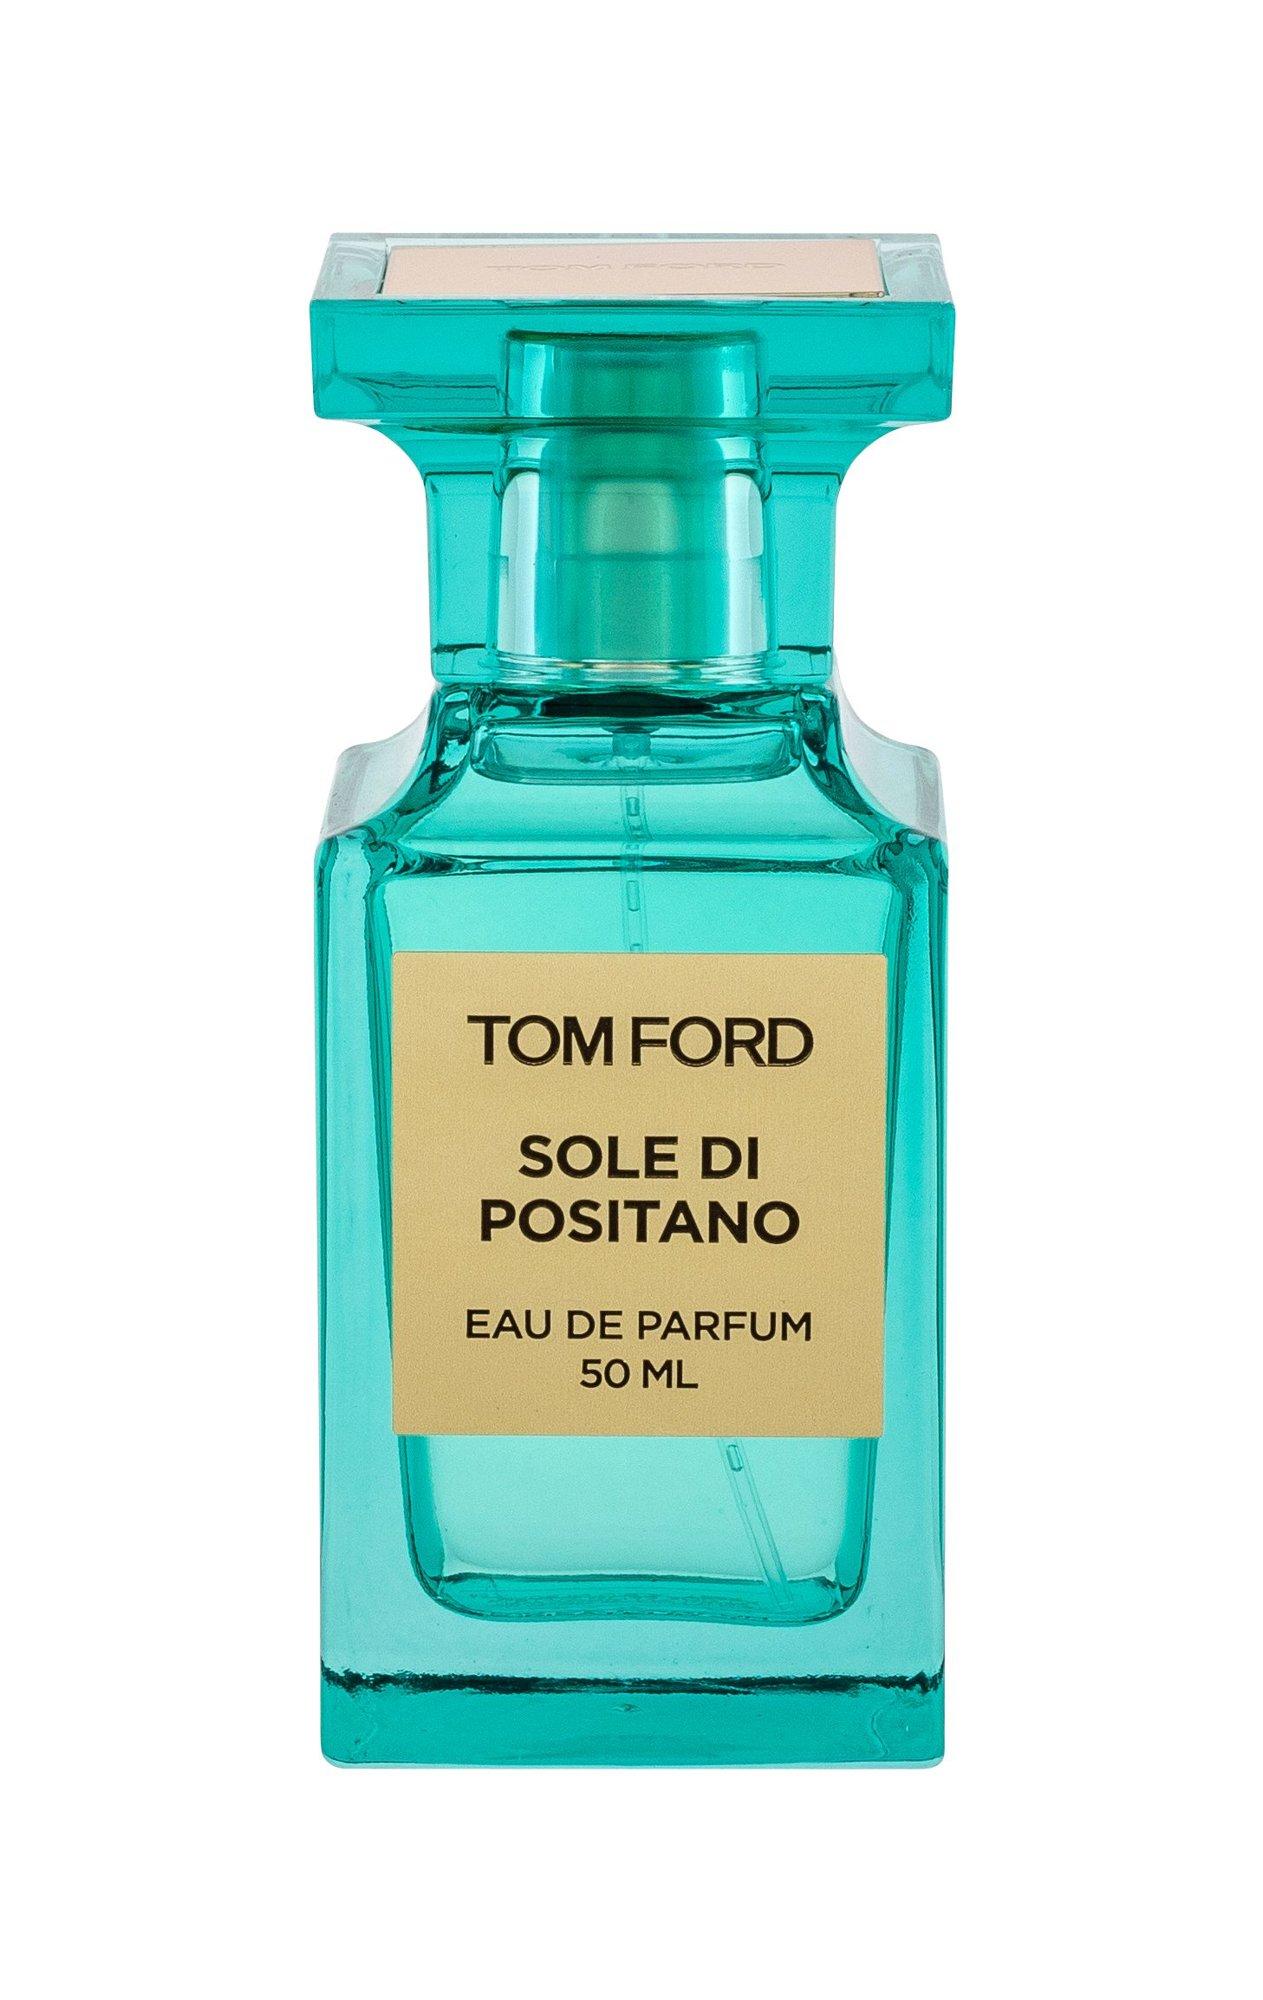 TOM FORD Sole di Positano, Parfumovaná voda 100ml